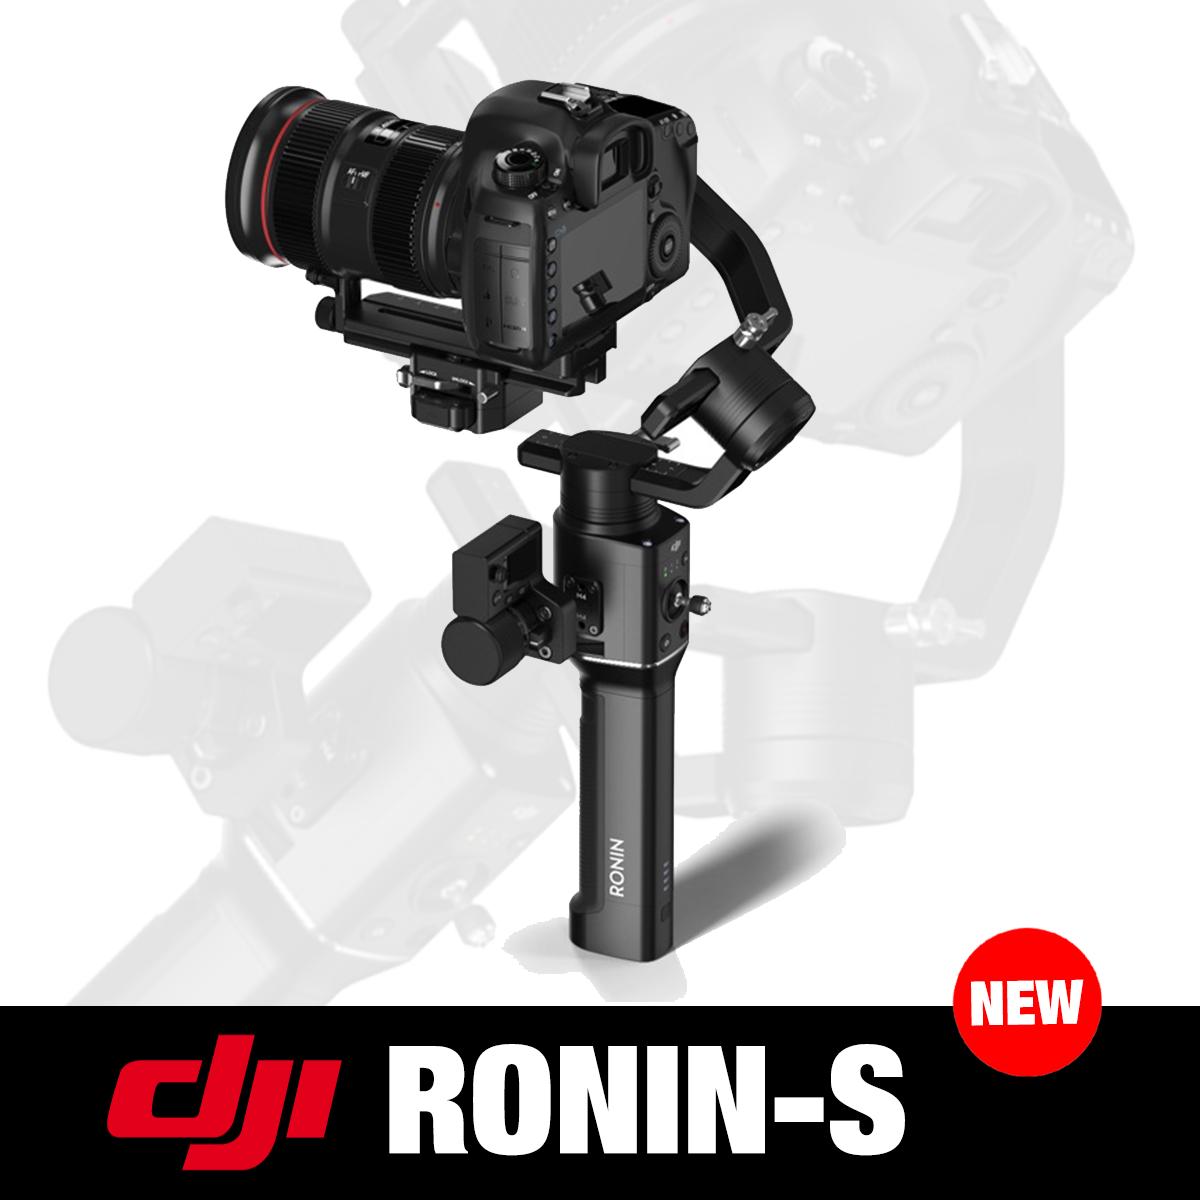 DJI Ronin-S  электронный стедикам для камер (DJRONINS) (CP.ZM.00000104.01)